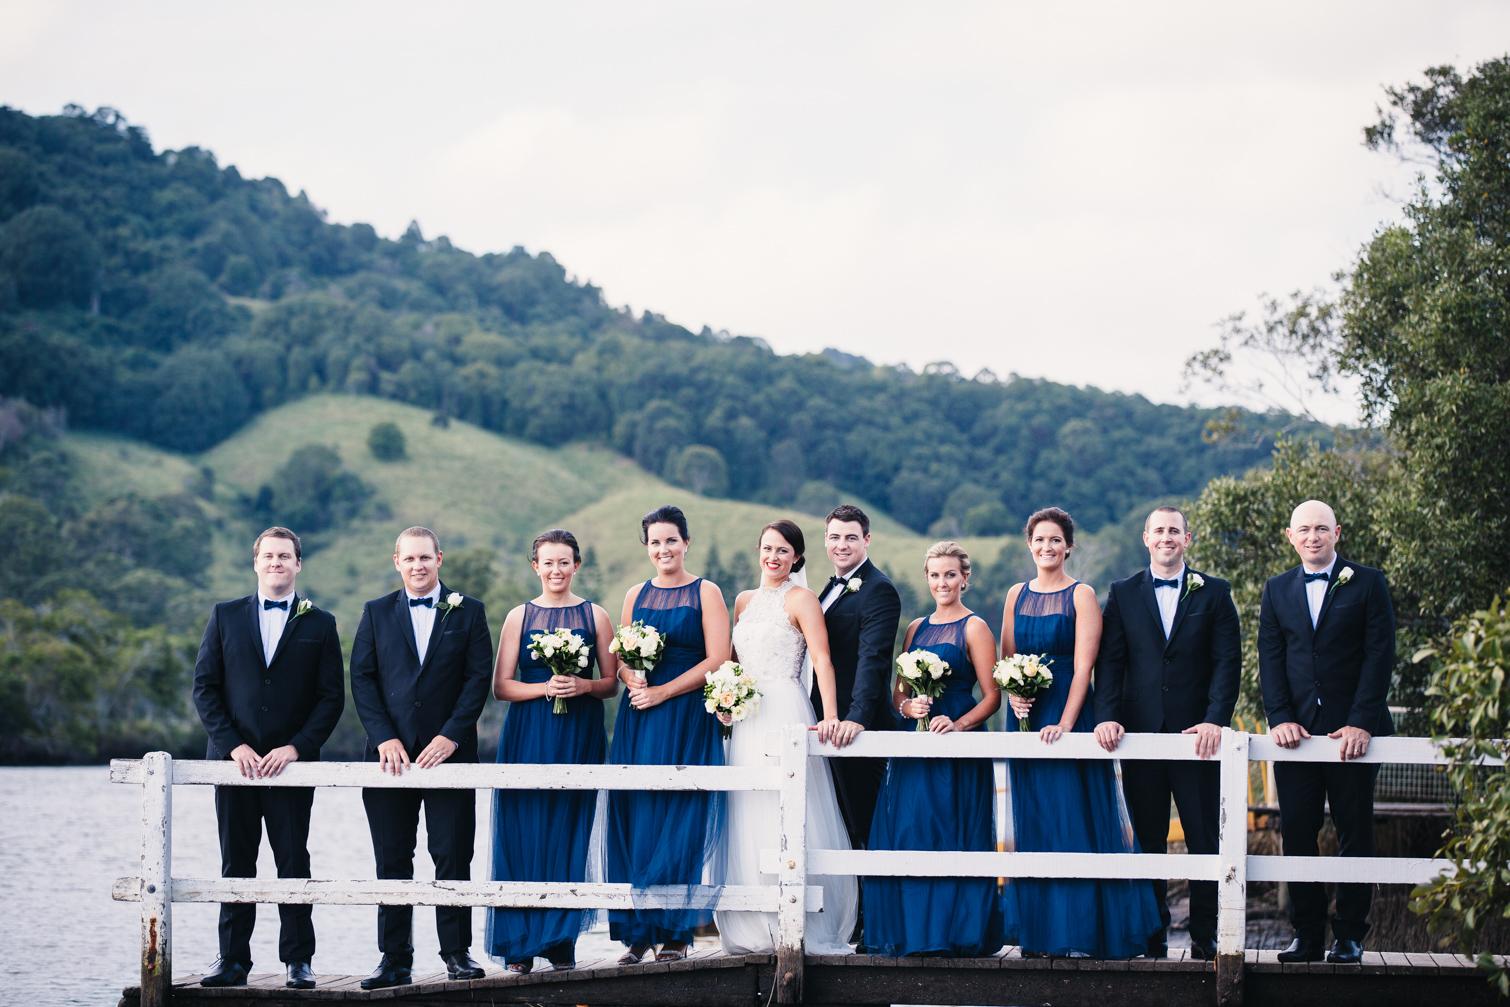 Osteria wedding_New Black Studios 37.jpg